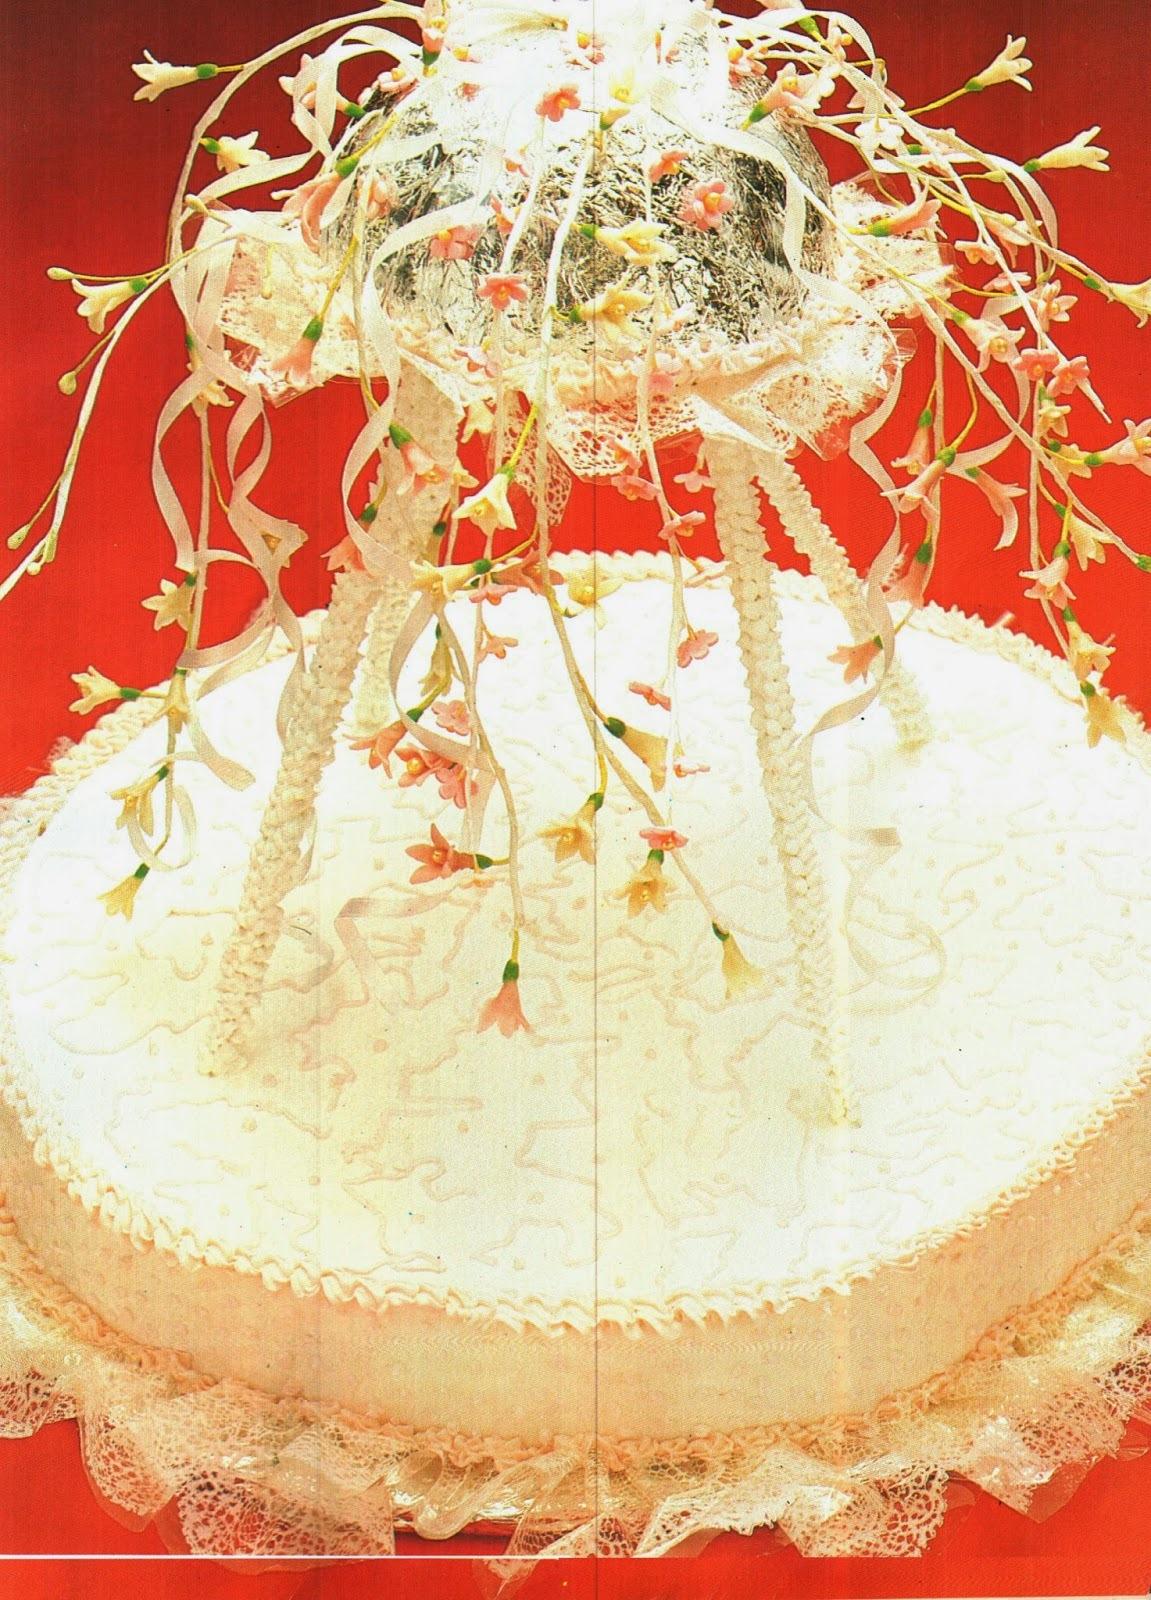 bolo simples de meio quilo